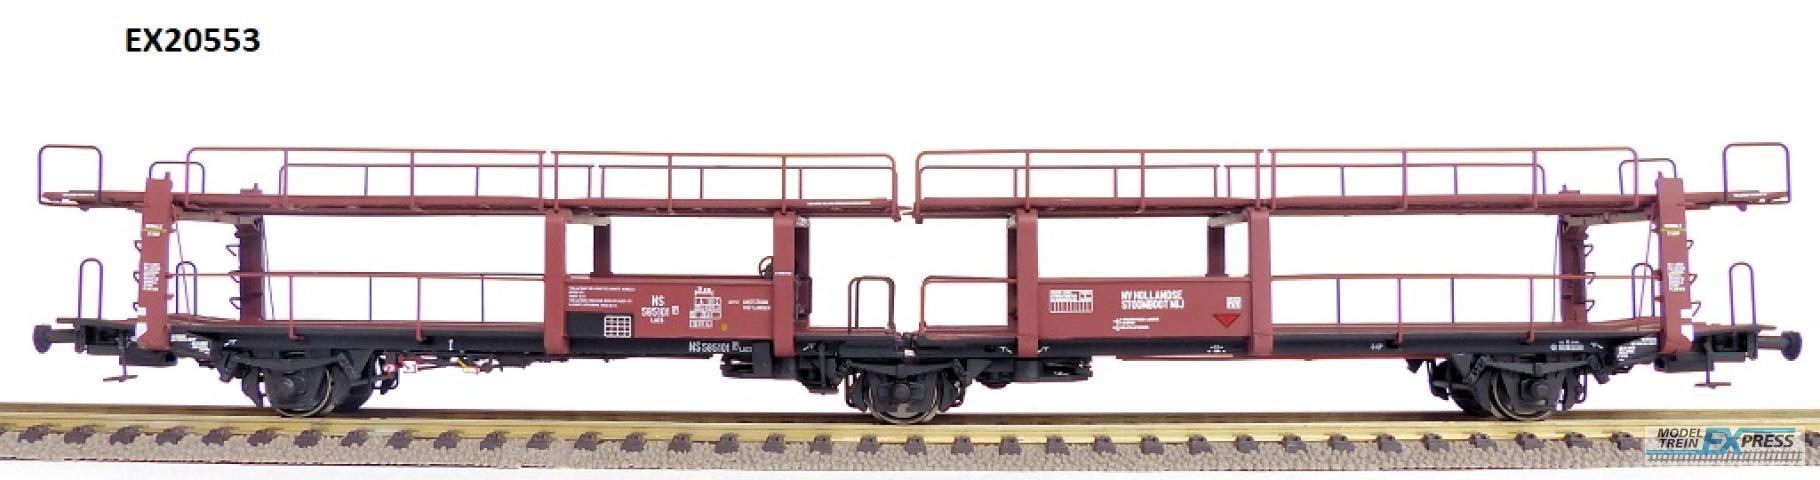 Exact-train 20553